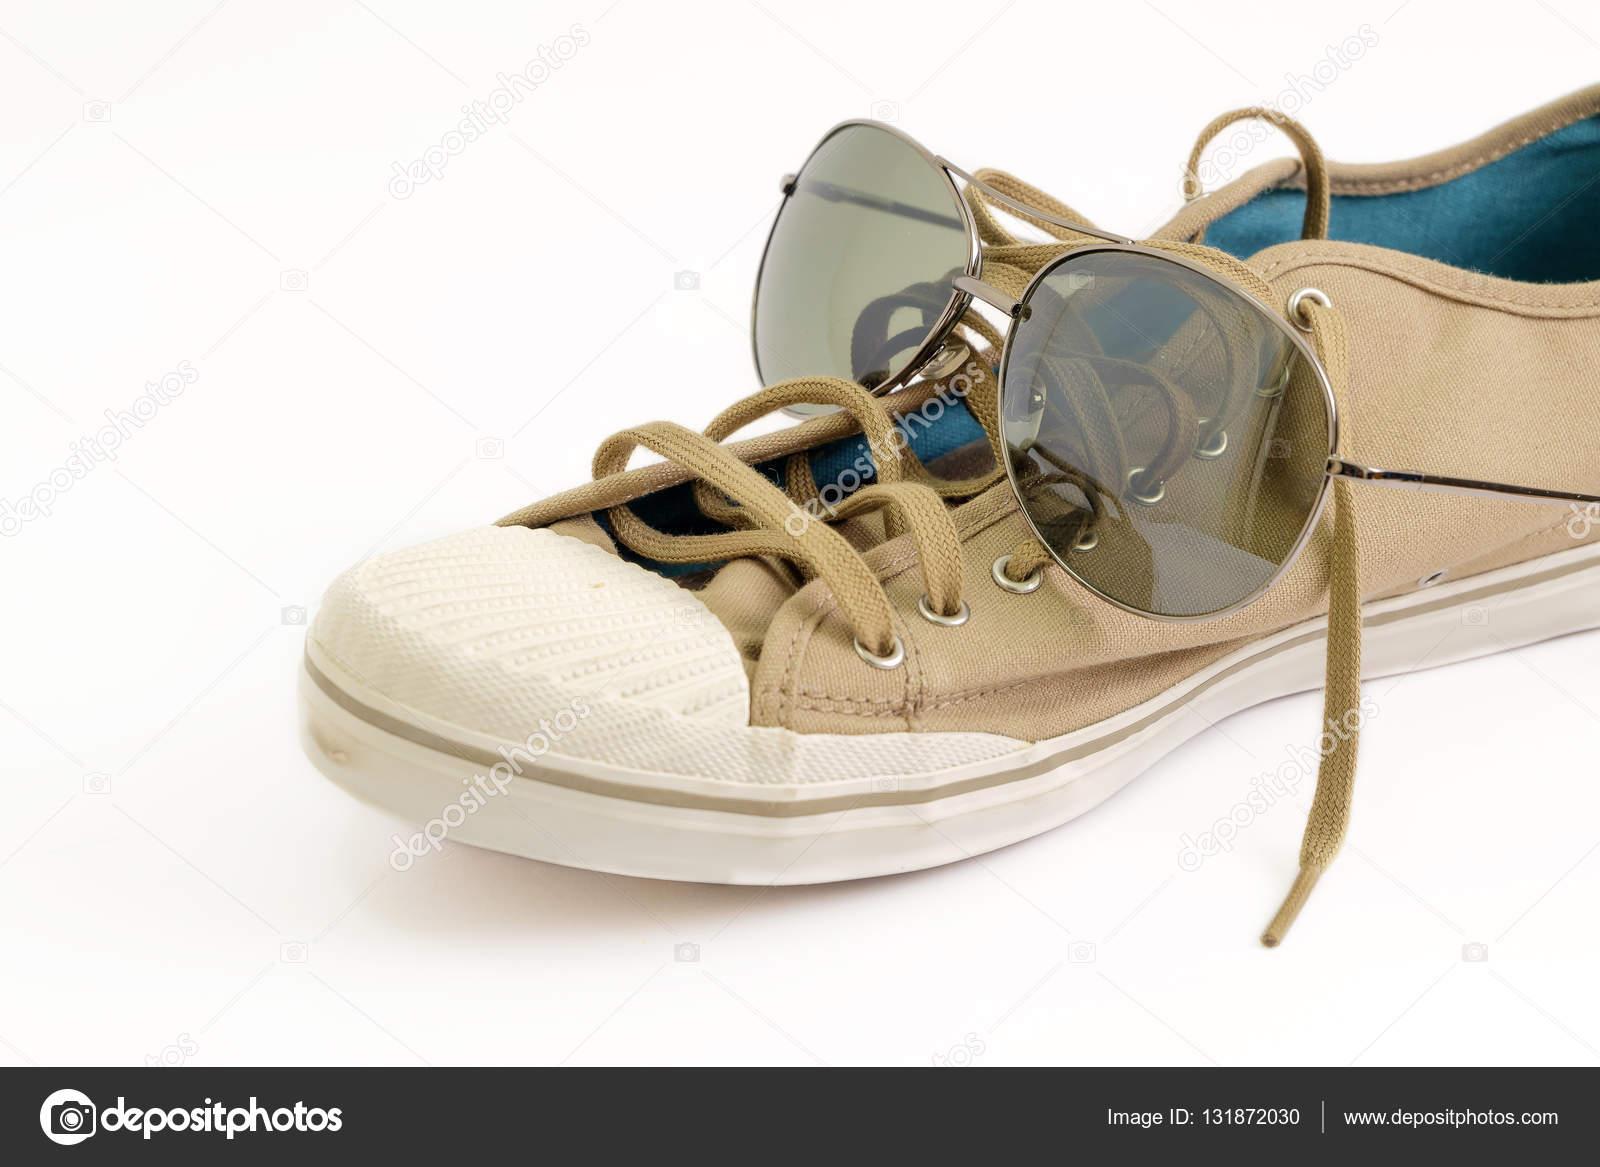 Zapatos y vidrio — Foto de stock © winyoophoto  131872030 d4e44983774b